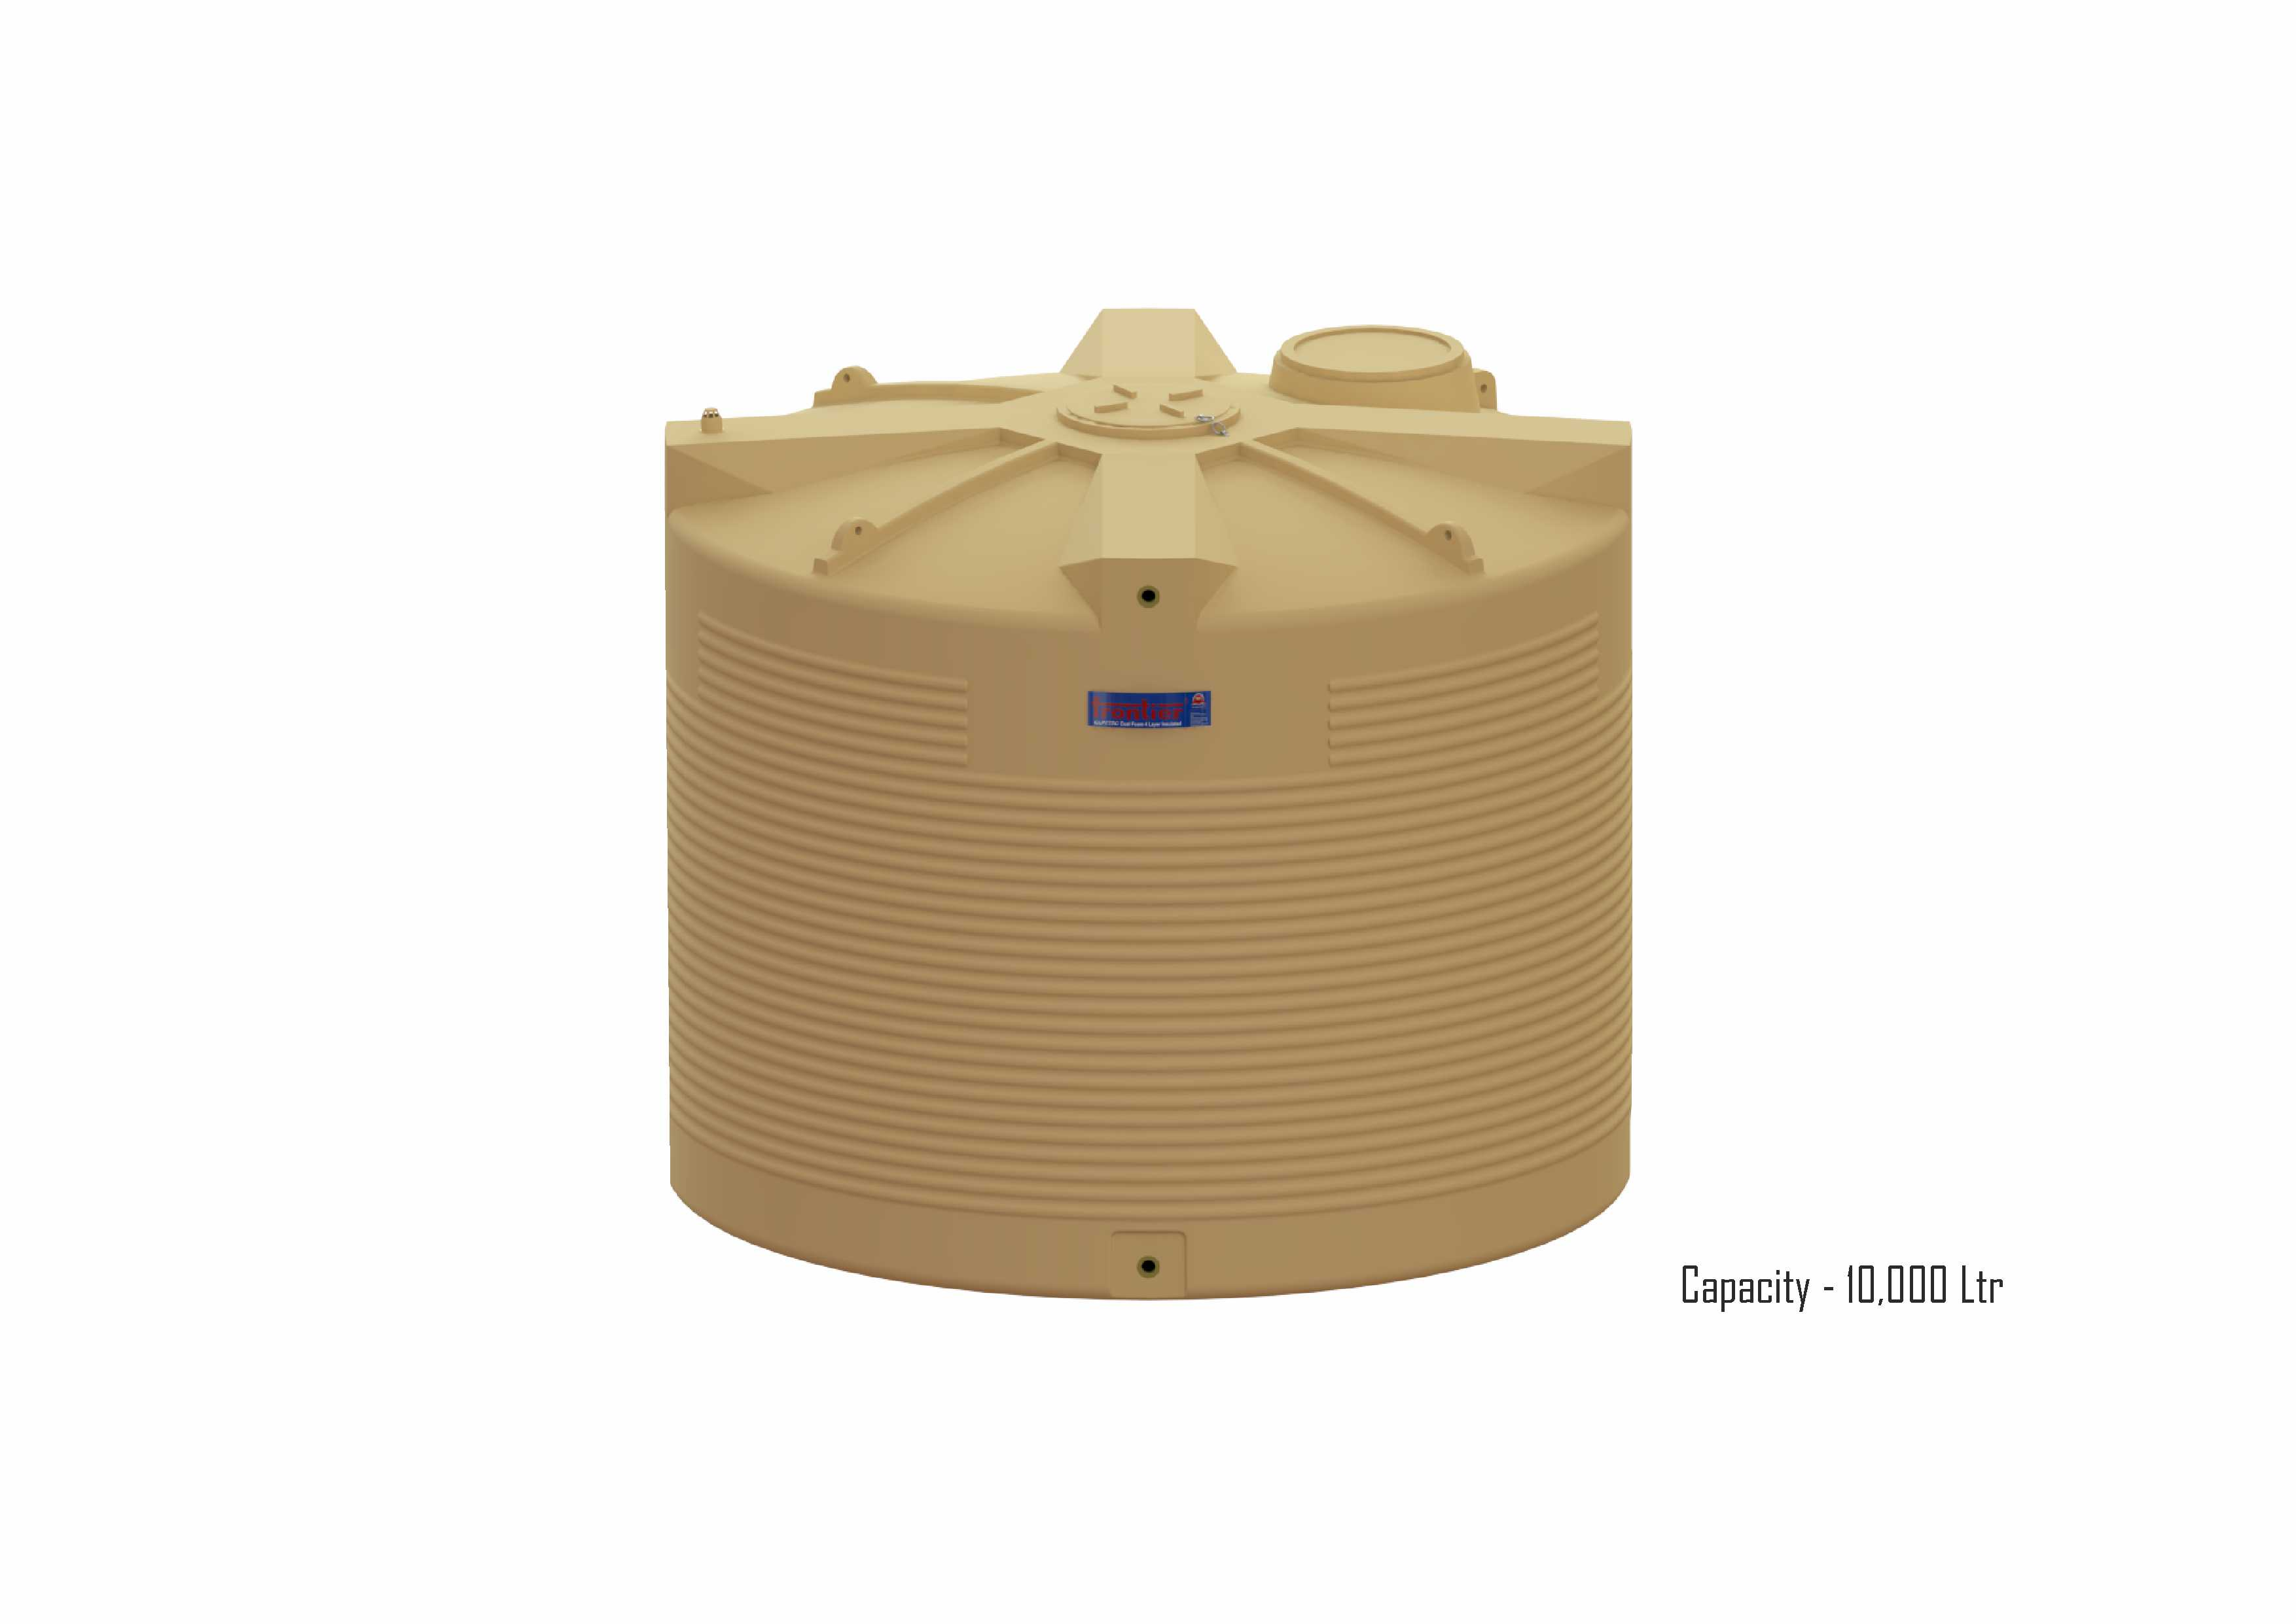 Dual Foam Industrial Water Storage Tank 4 Layer Industrial Water Storage